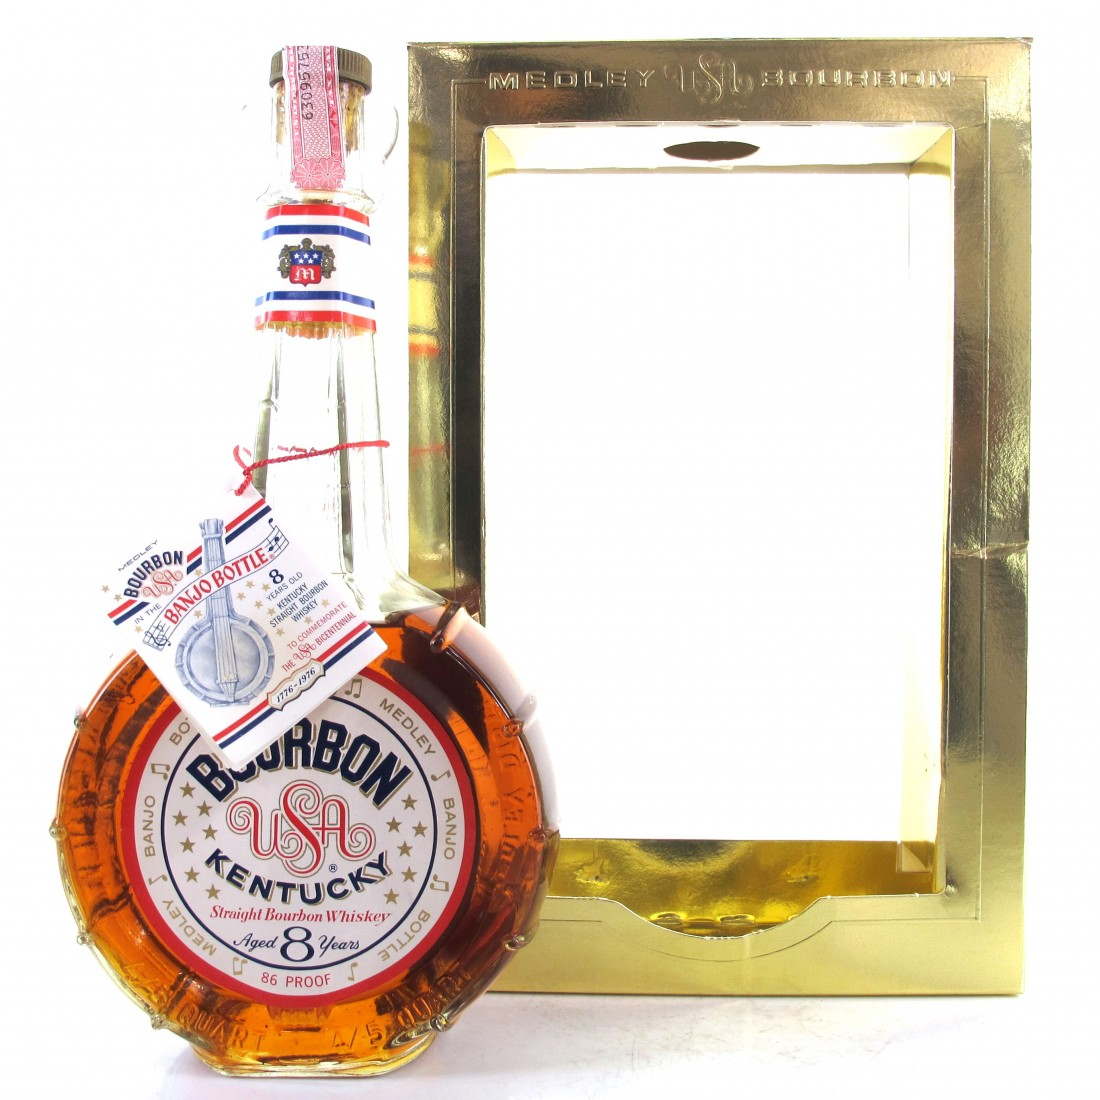 Medley 8 Year Old Bicentennial Bourbon 1976 / Banjo Bottle